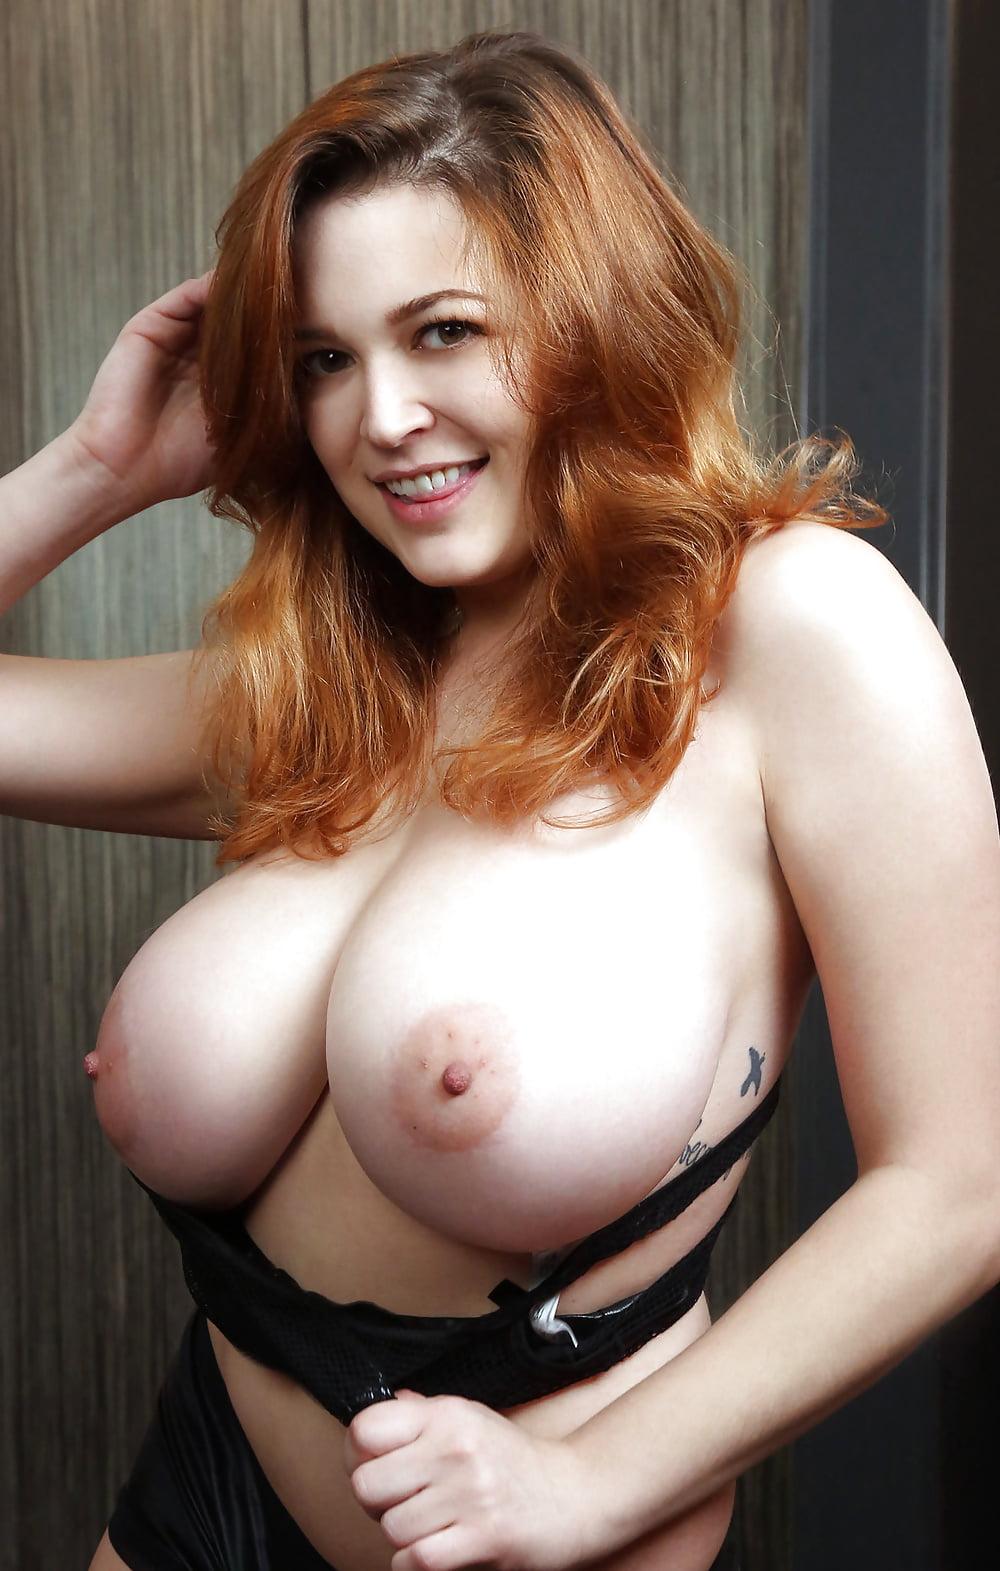 redhead-big-boobs-bike-pokemon-lesbians-naked